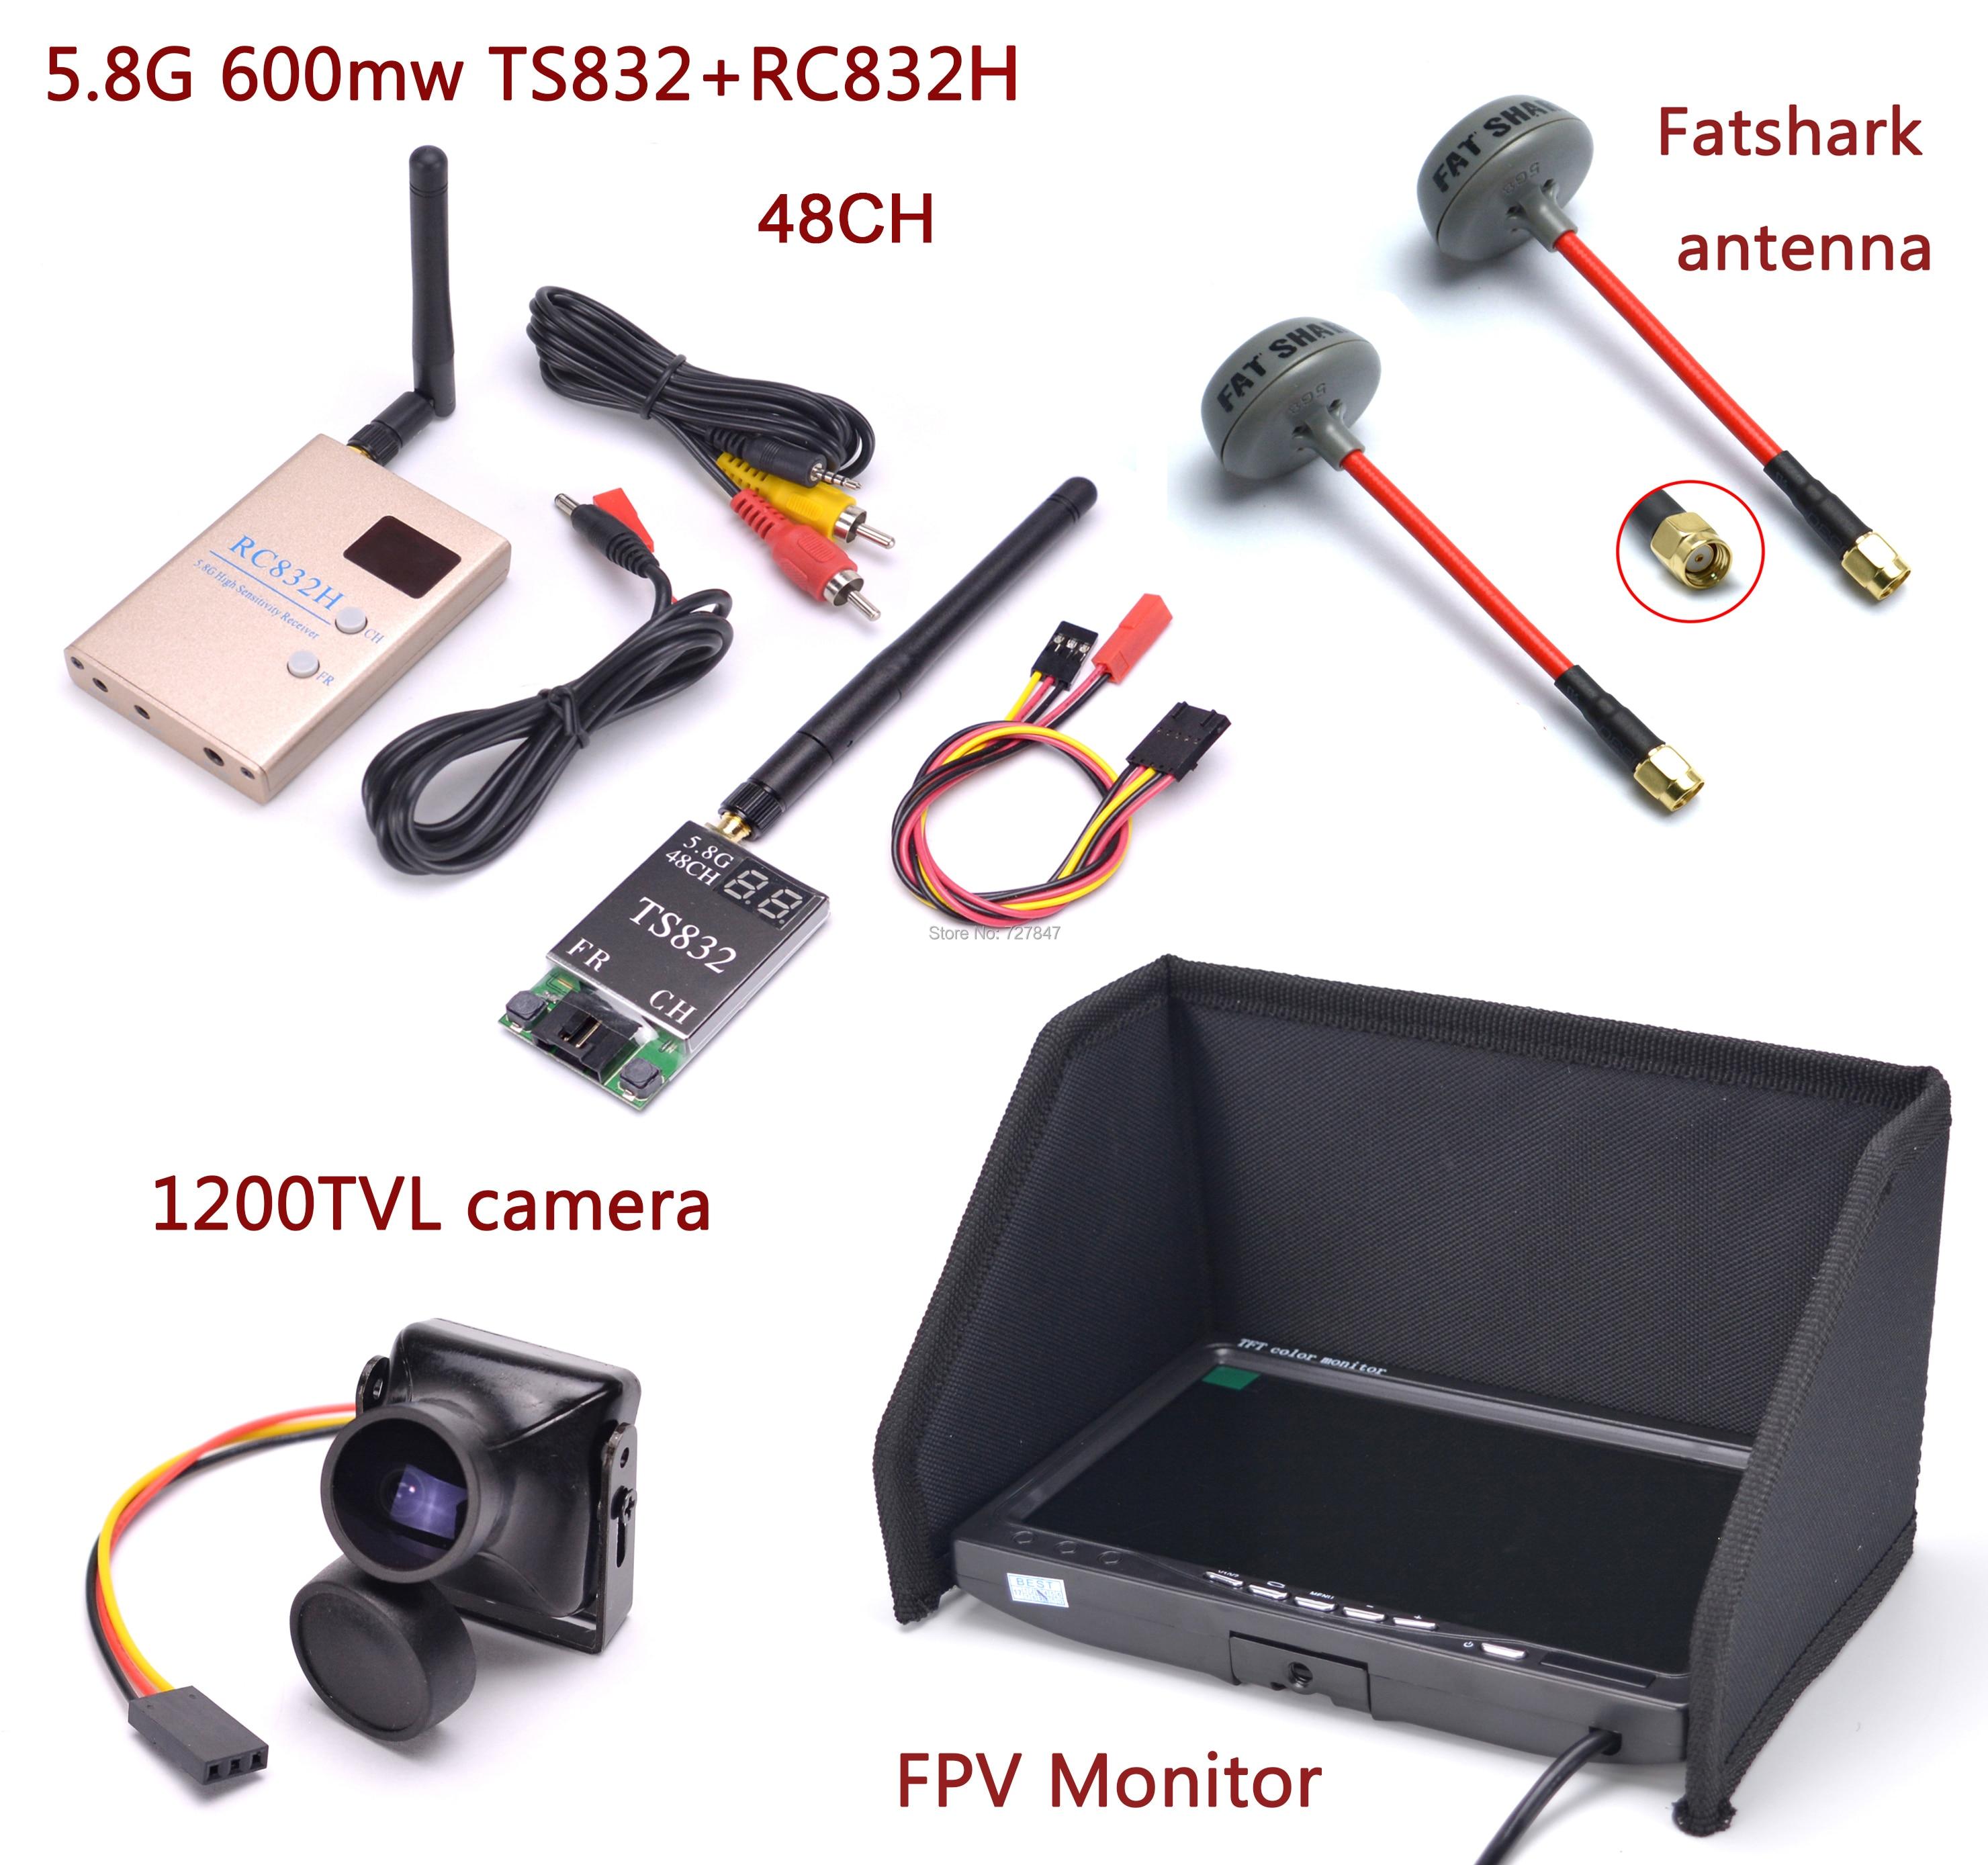 FPV Kit de sistema Combo 1200TVL Cámara + 5,8 Ghz 600mw 48CH TS832 RC832S RC832 + IPS LCD de 7 pulgadas 1024x600 Monitor + antena